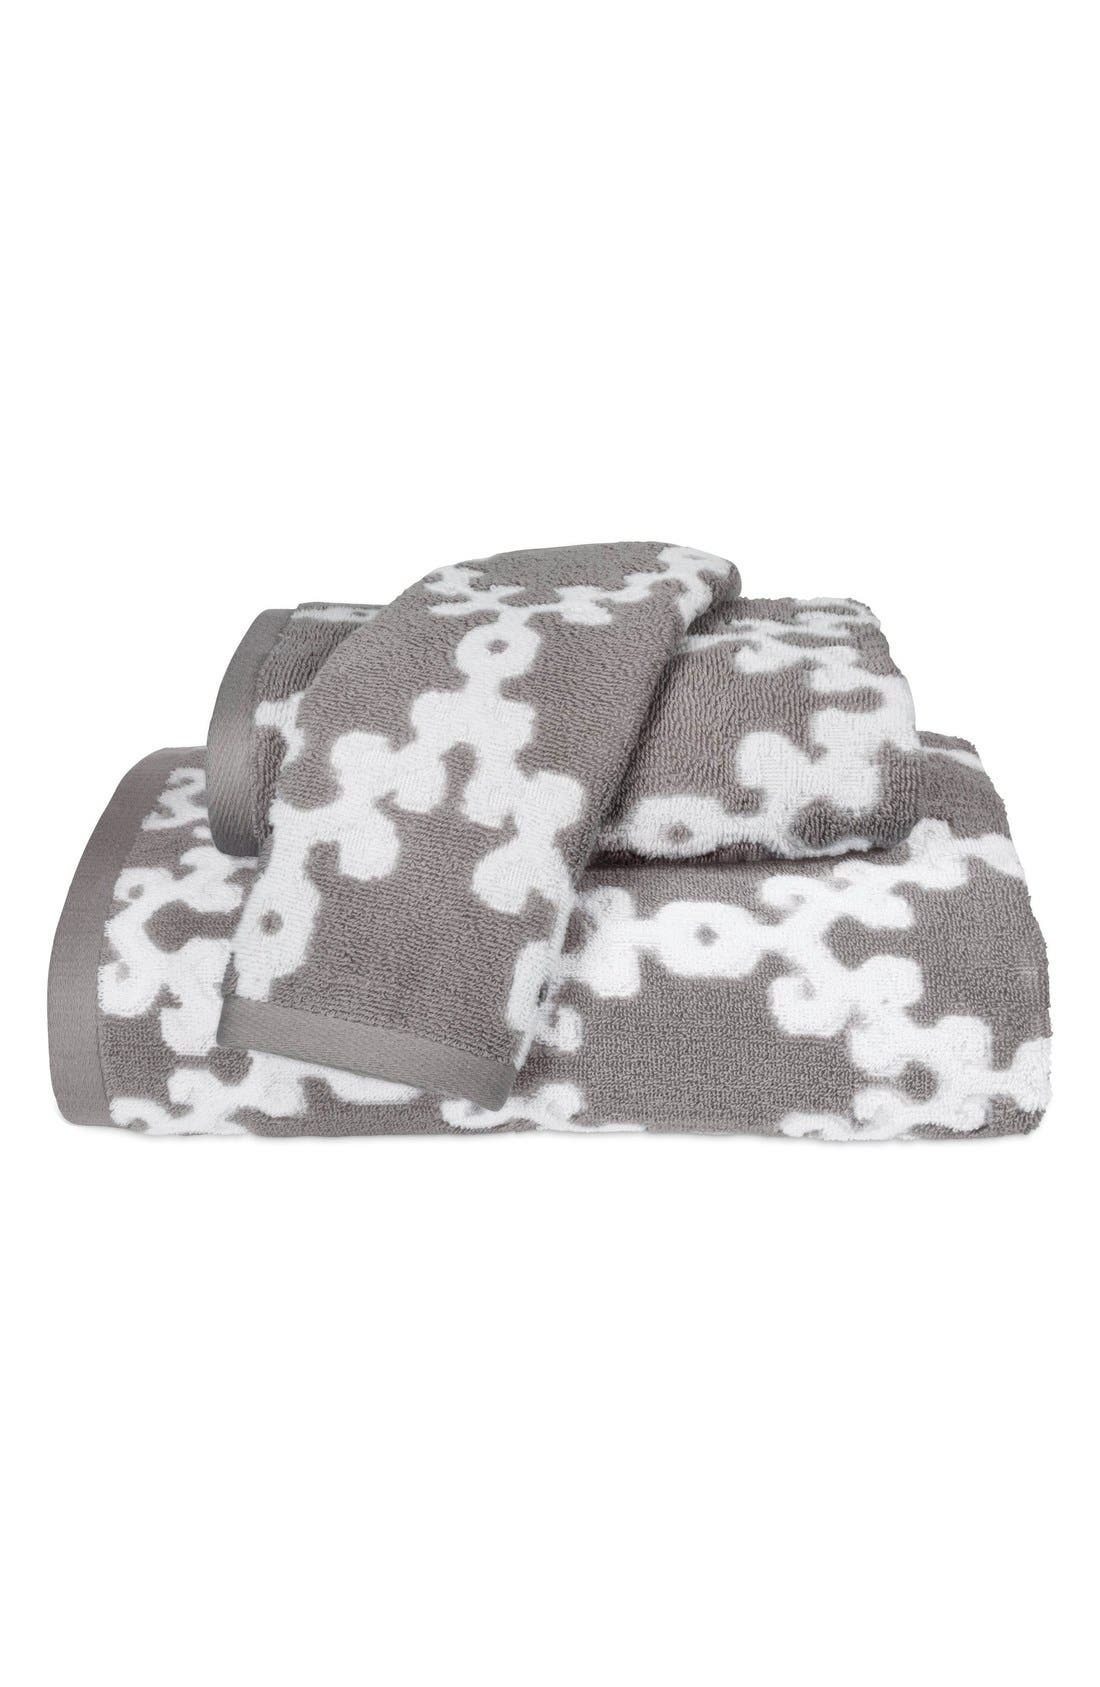 JOHN ROBSHAW 'Totem' Turkish Cotton Hand Towel